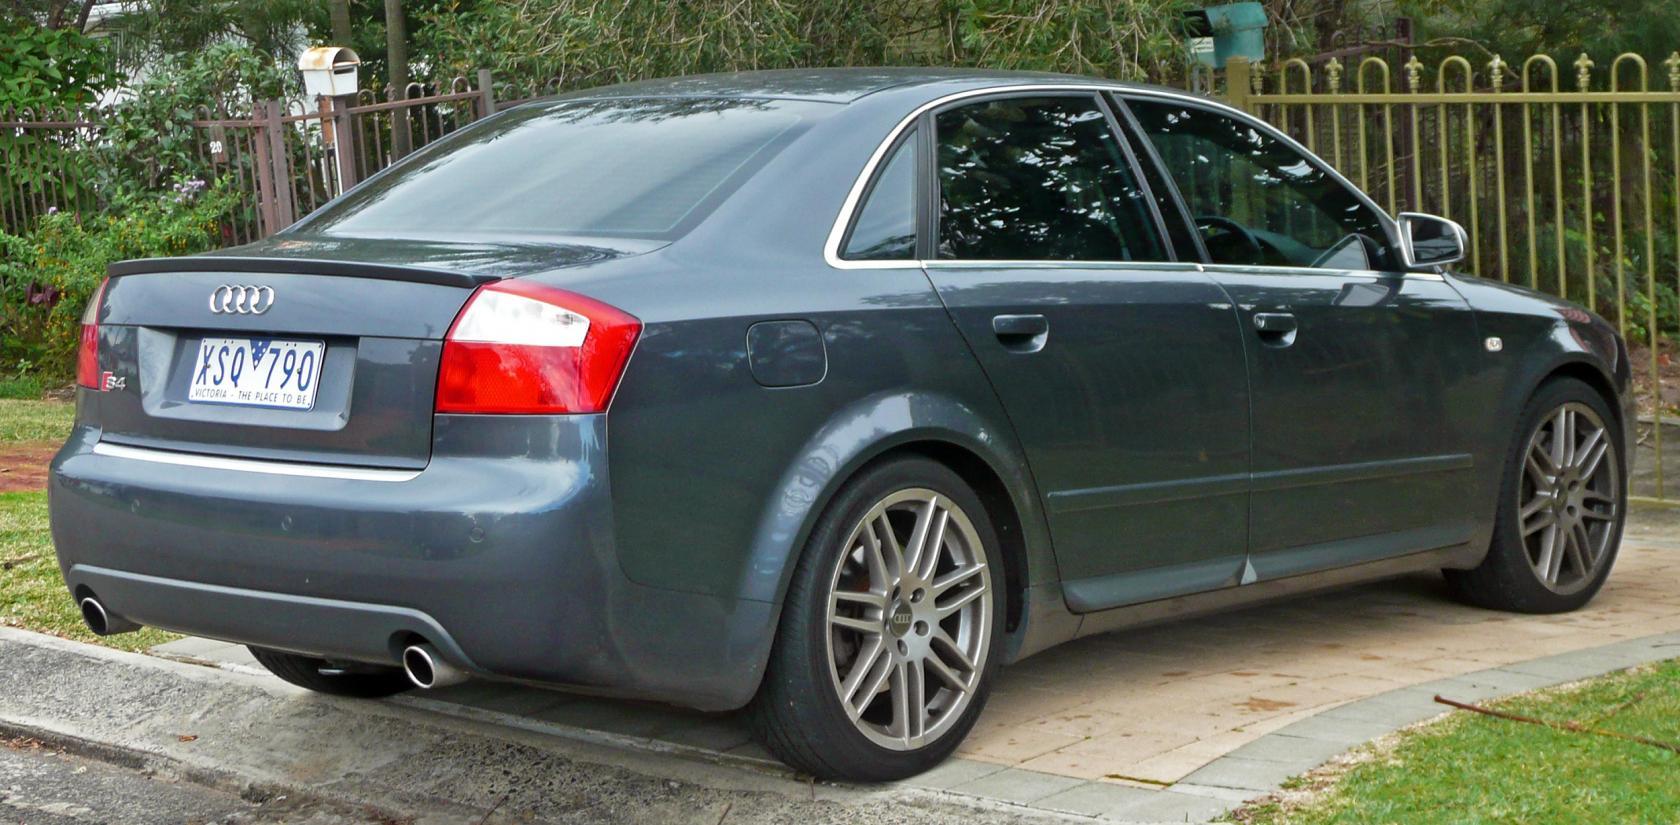 Audi-S4-B6-3